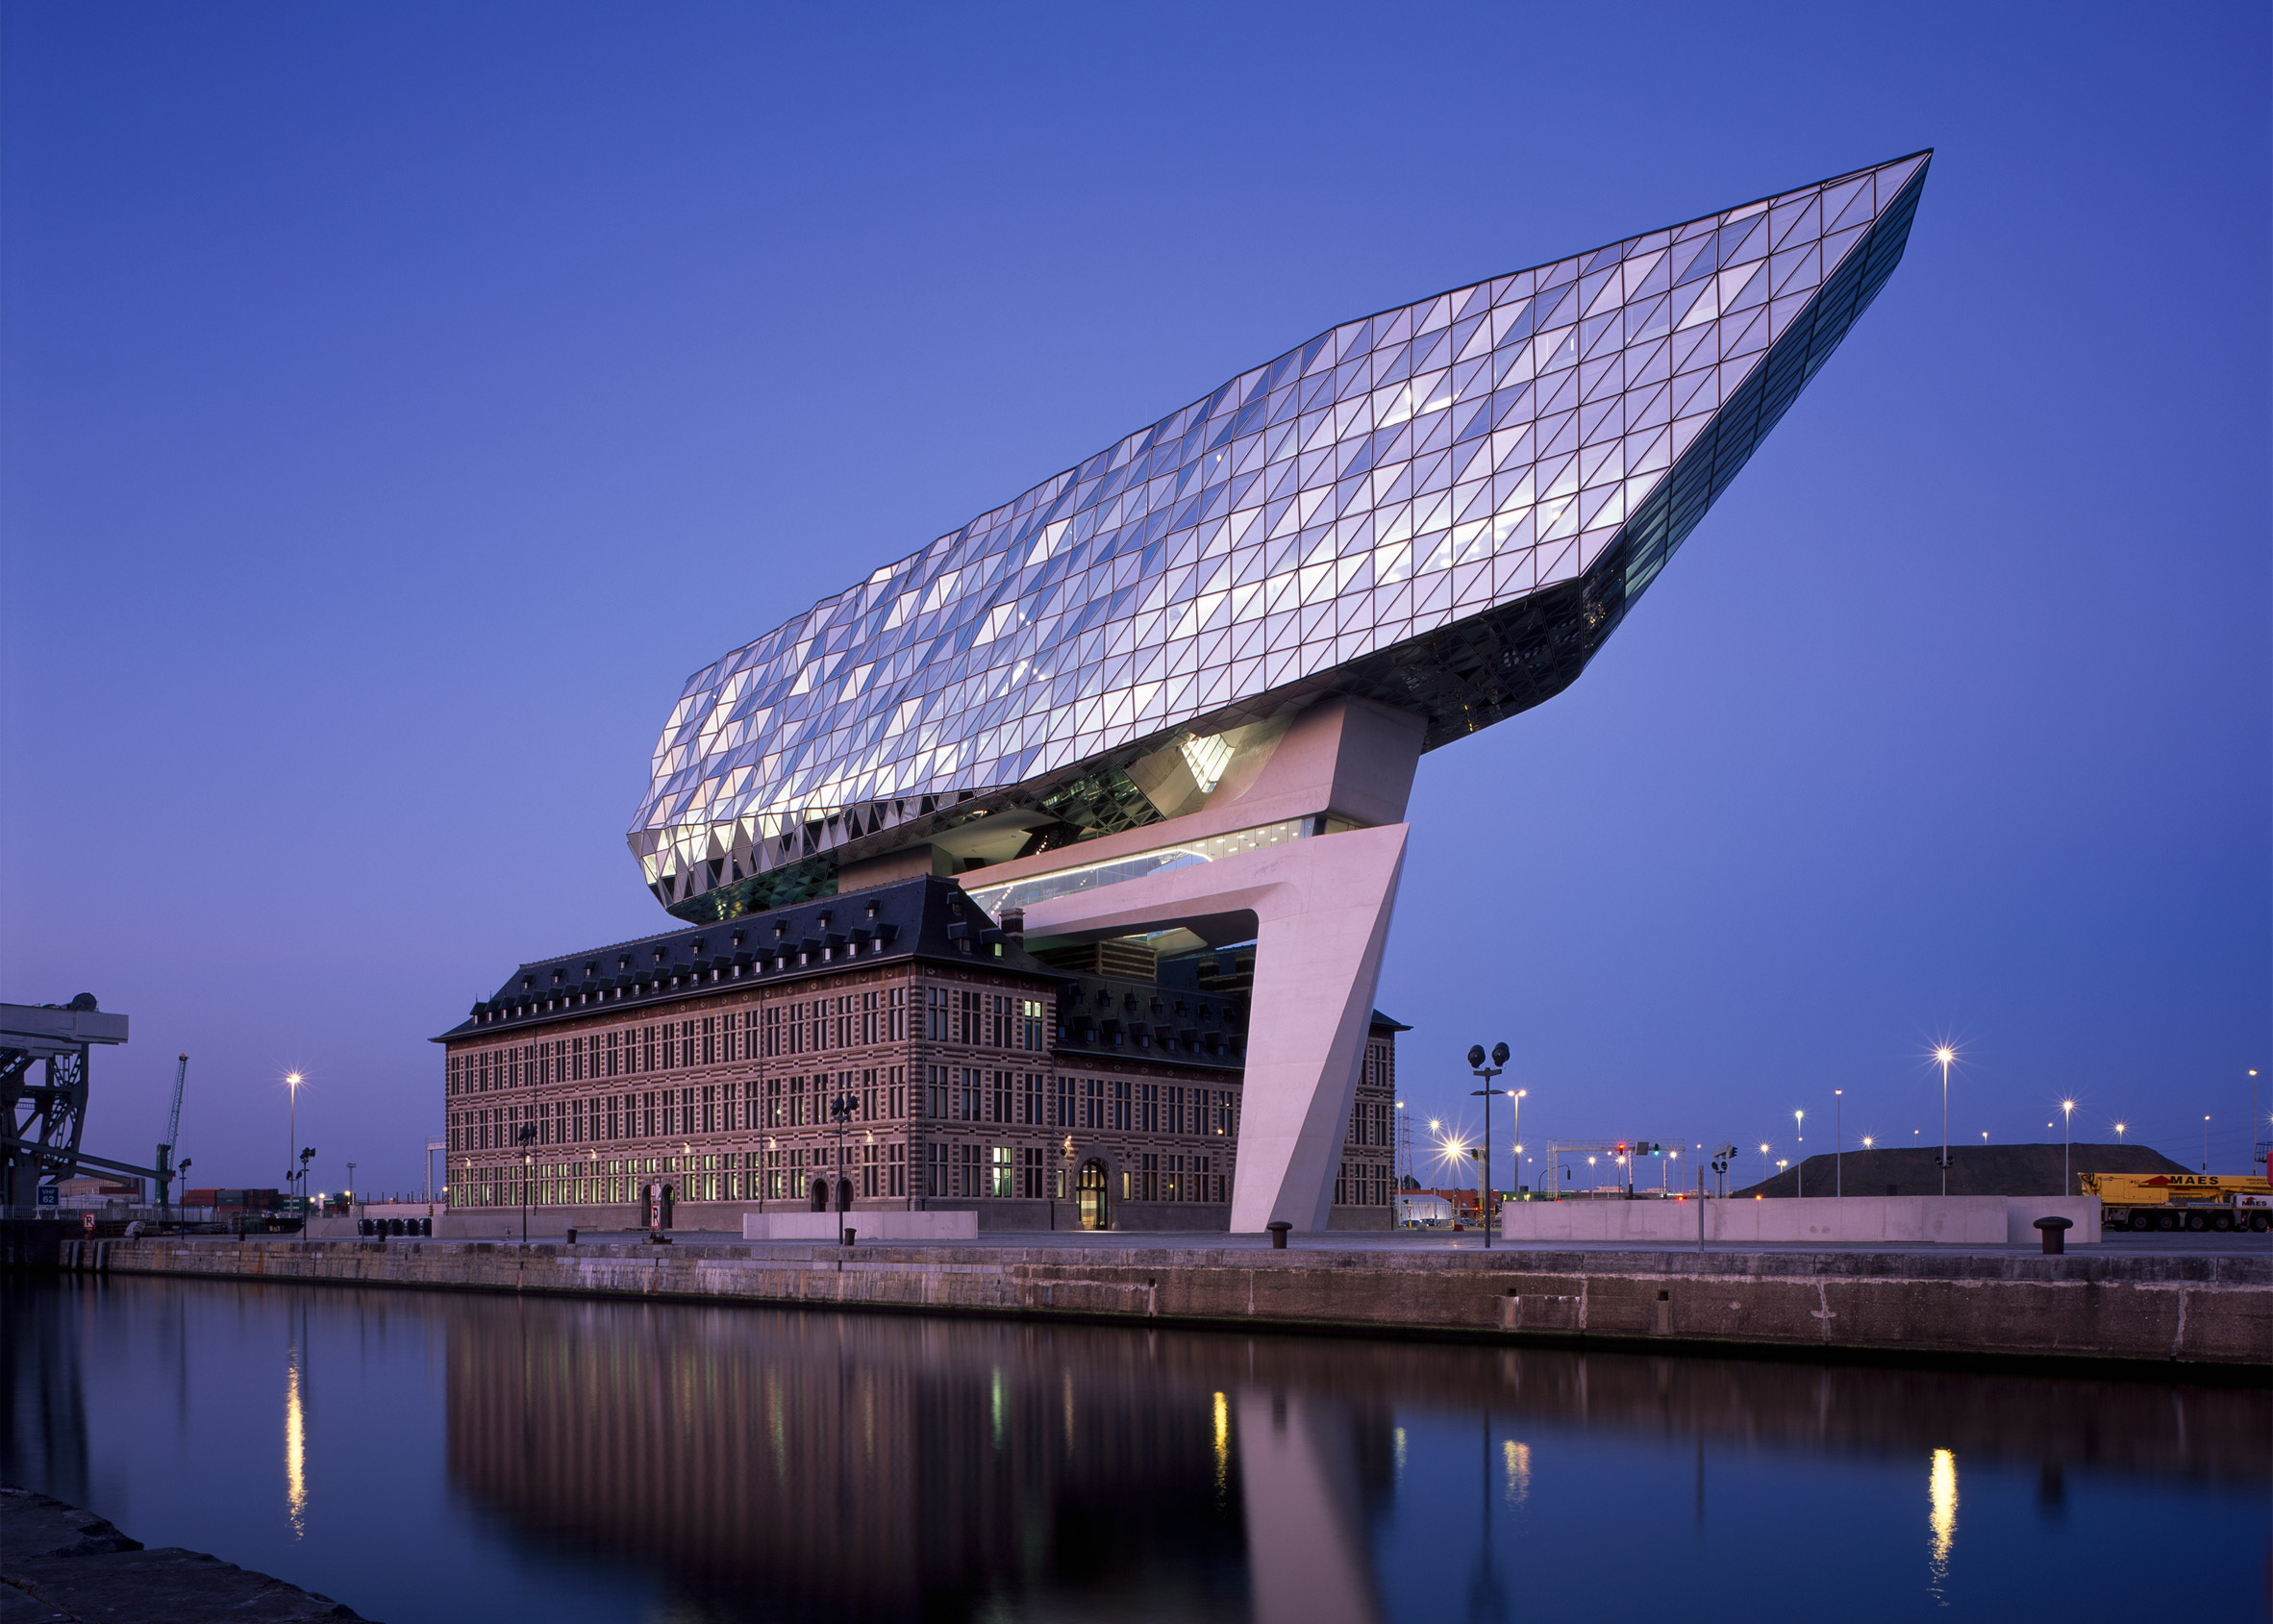 Port House Antwerp photographed by Helene Binet